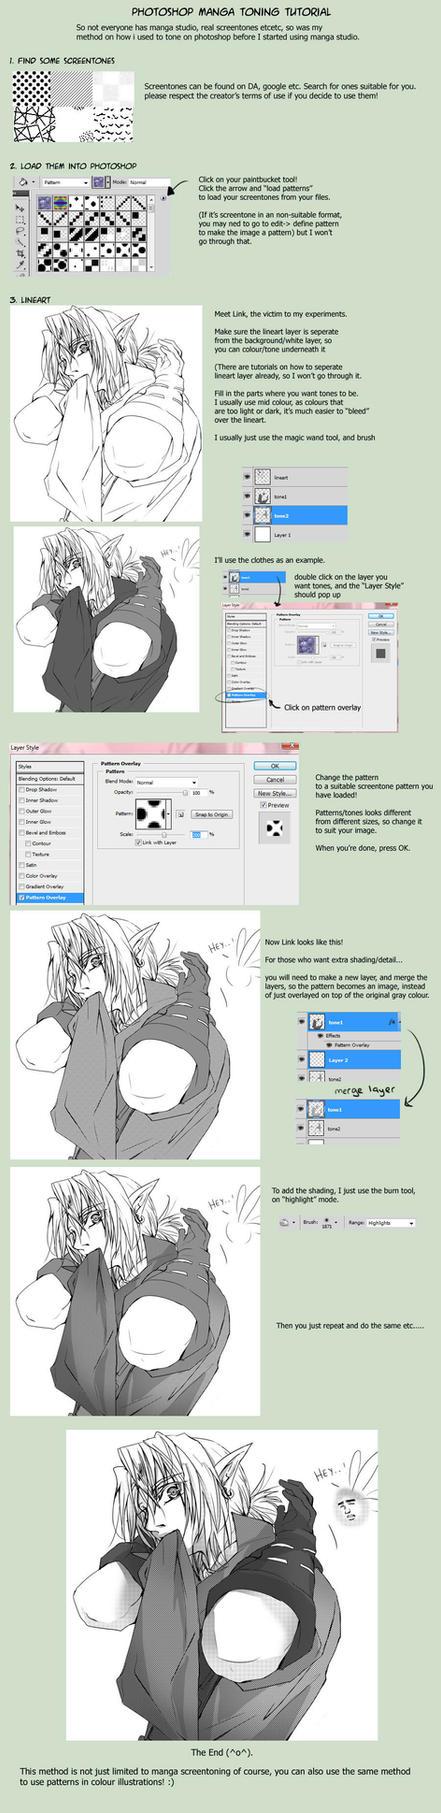 Photoshop toning tutorial by Miyukiko